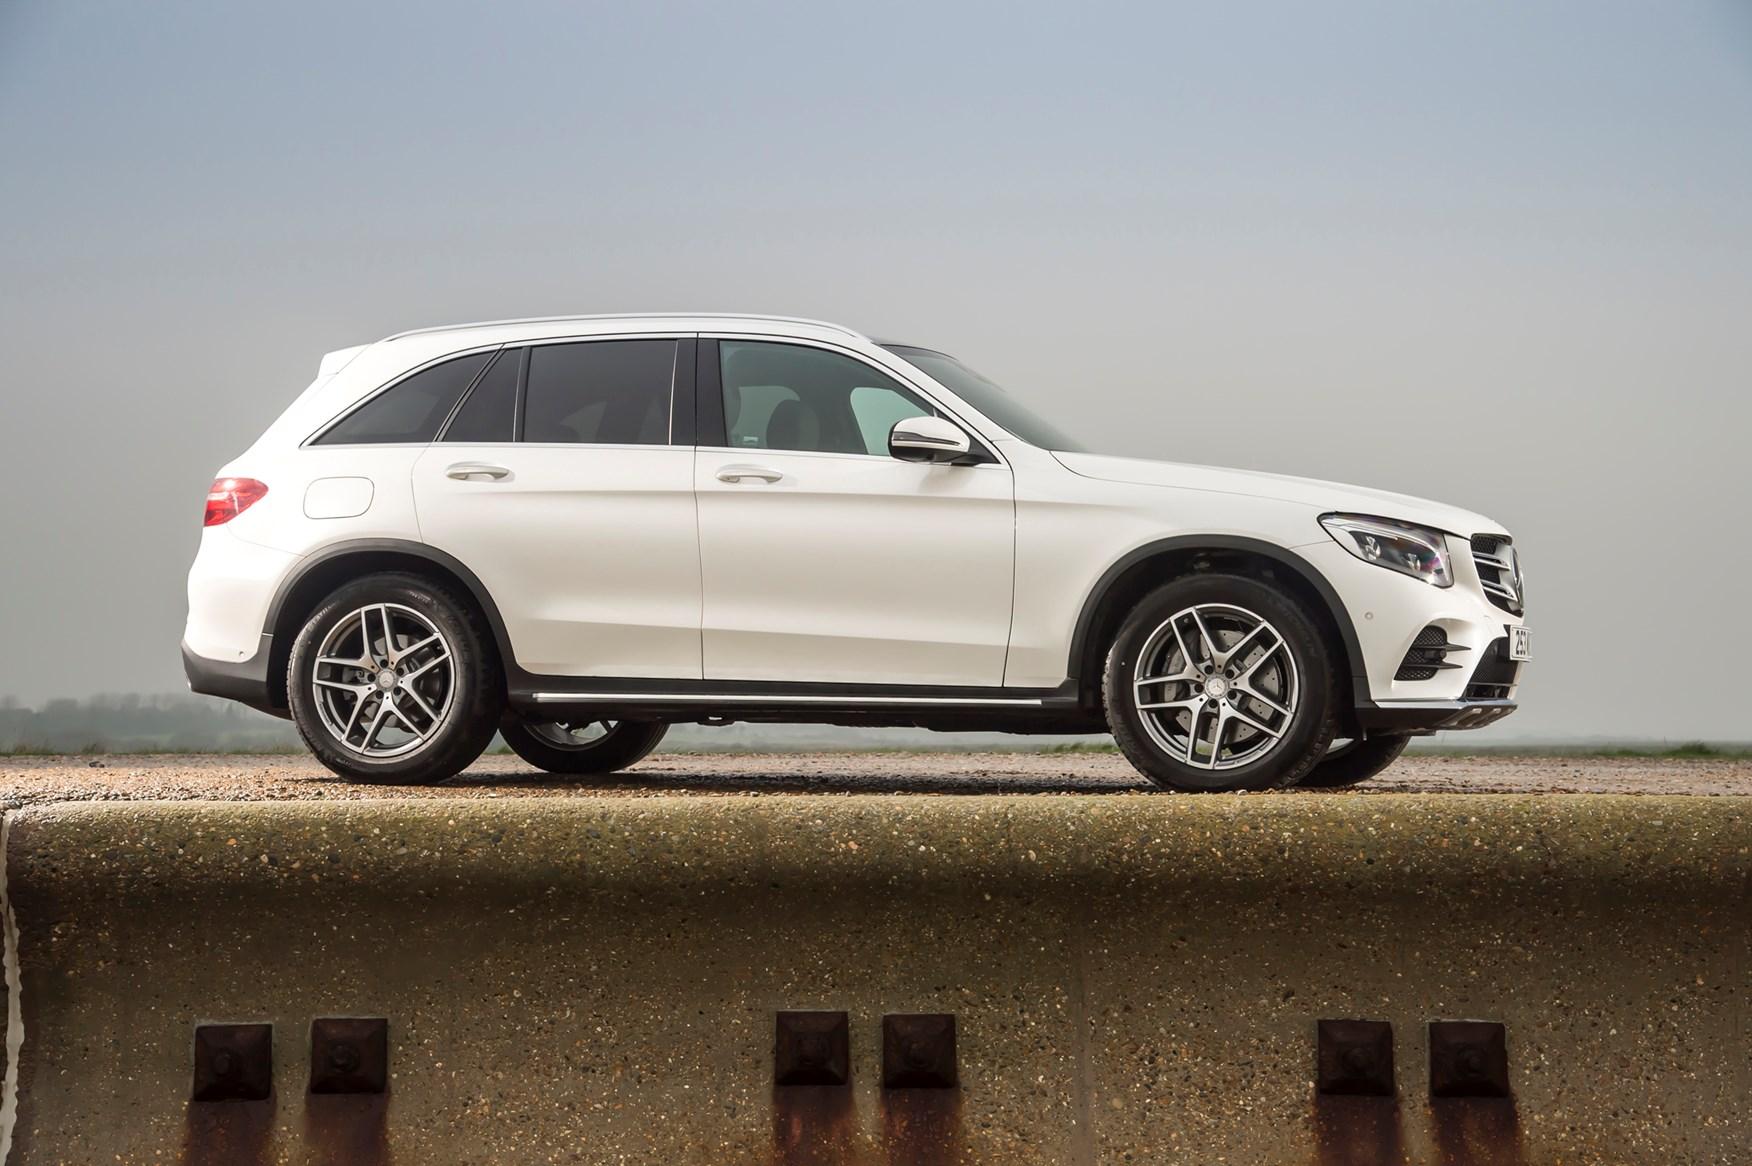 White 2016 Mercedes-Benz GLC SUV side elevation